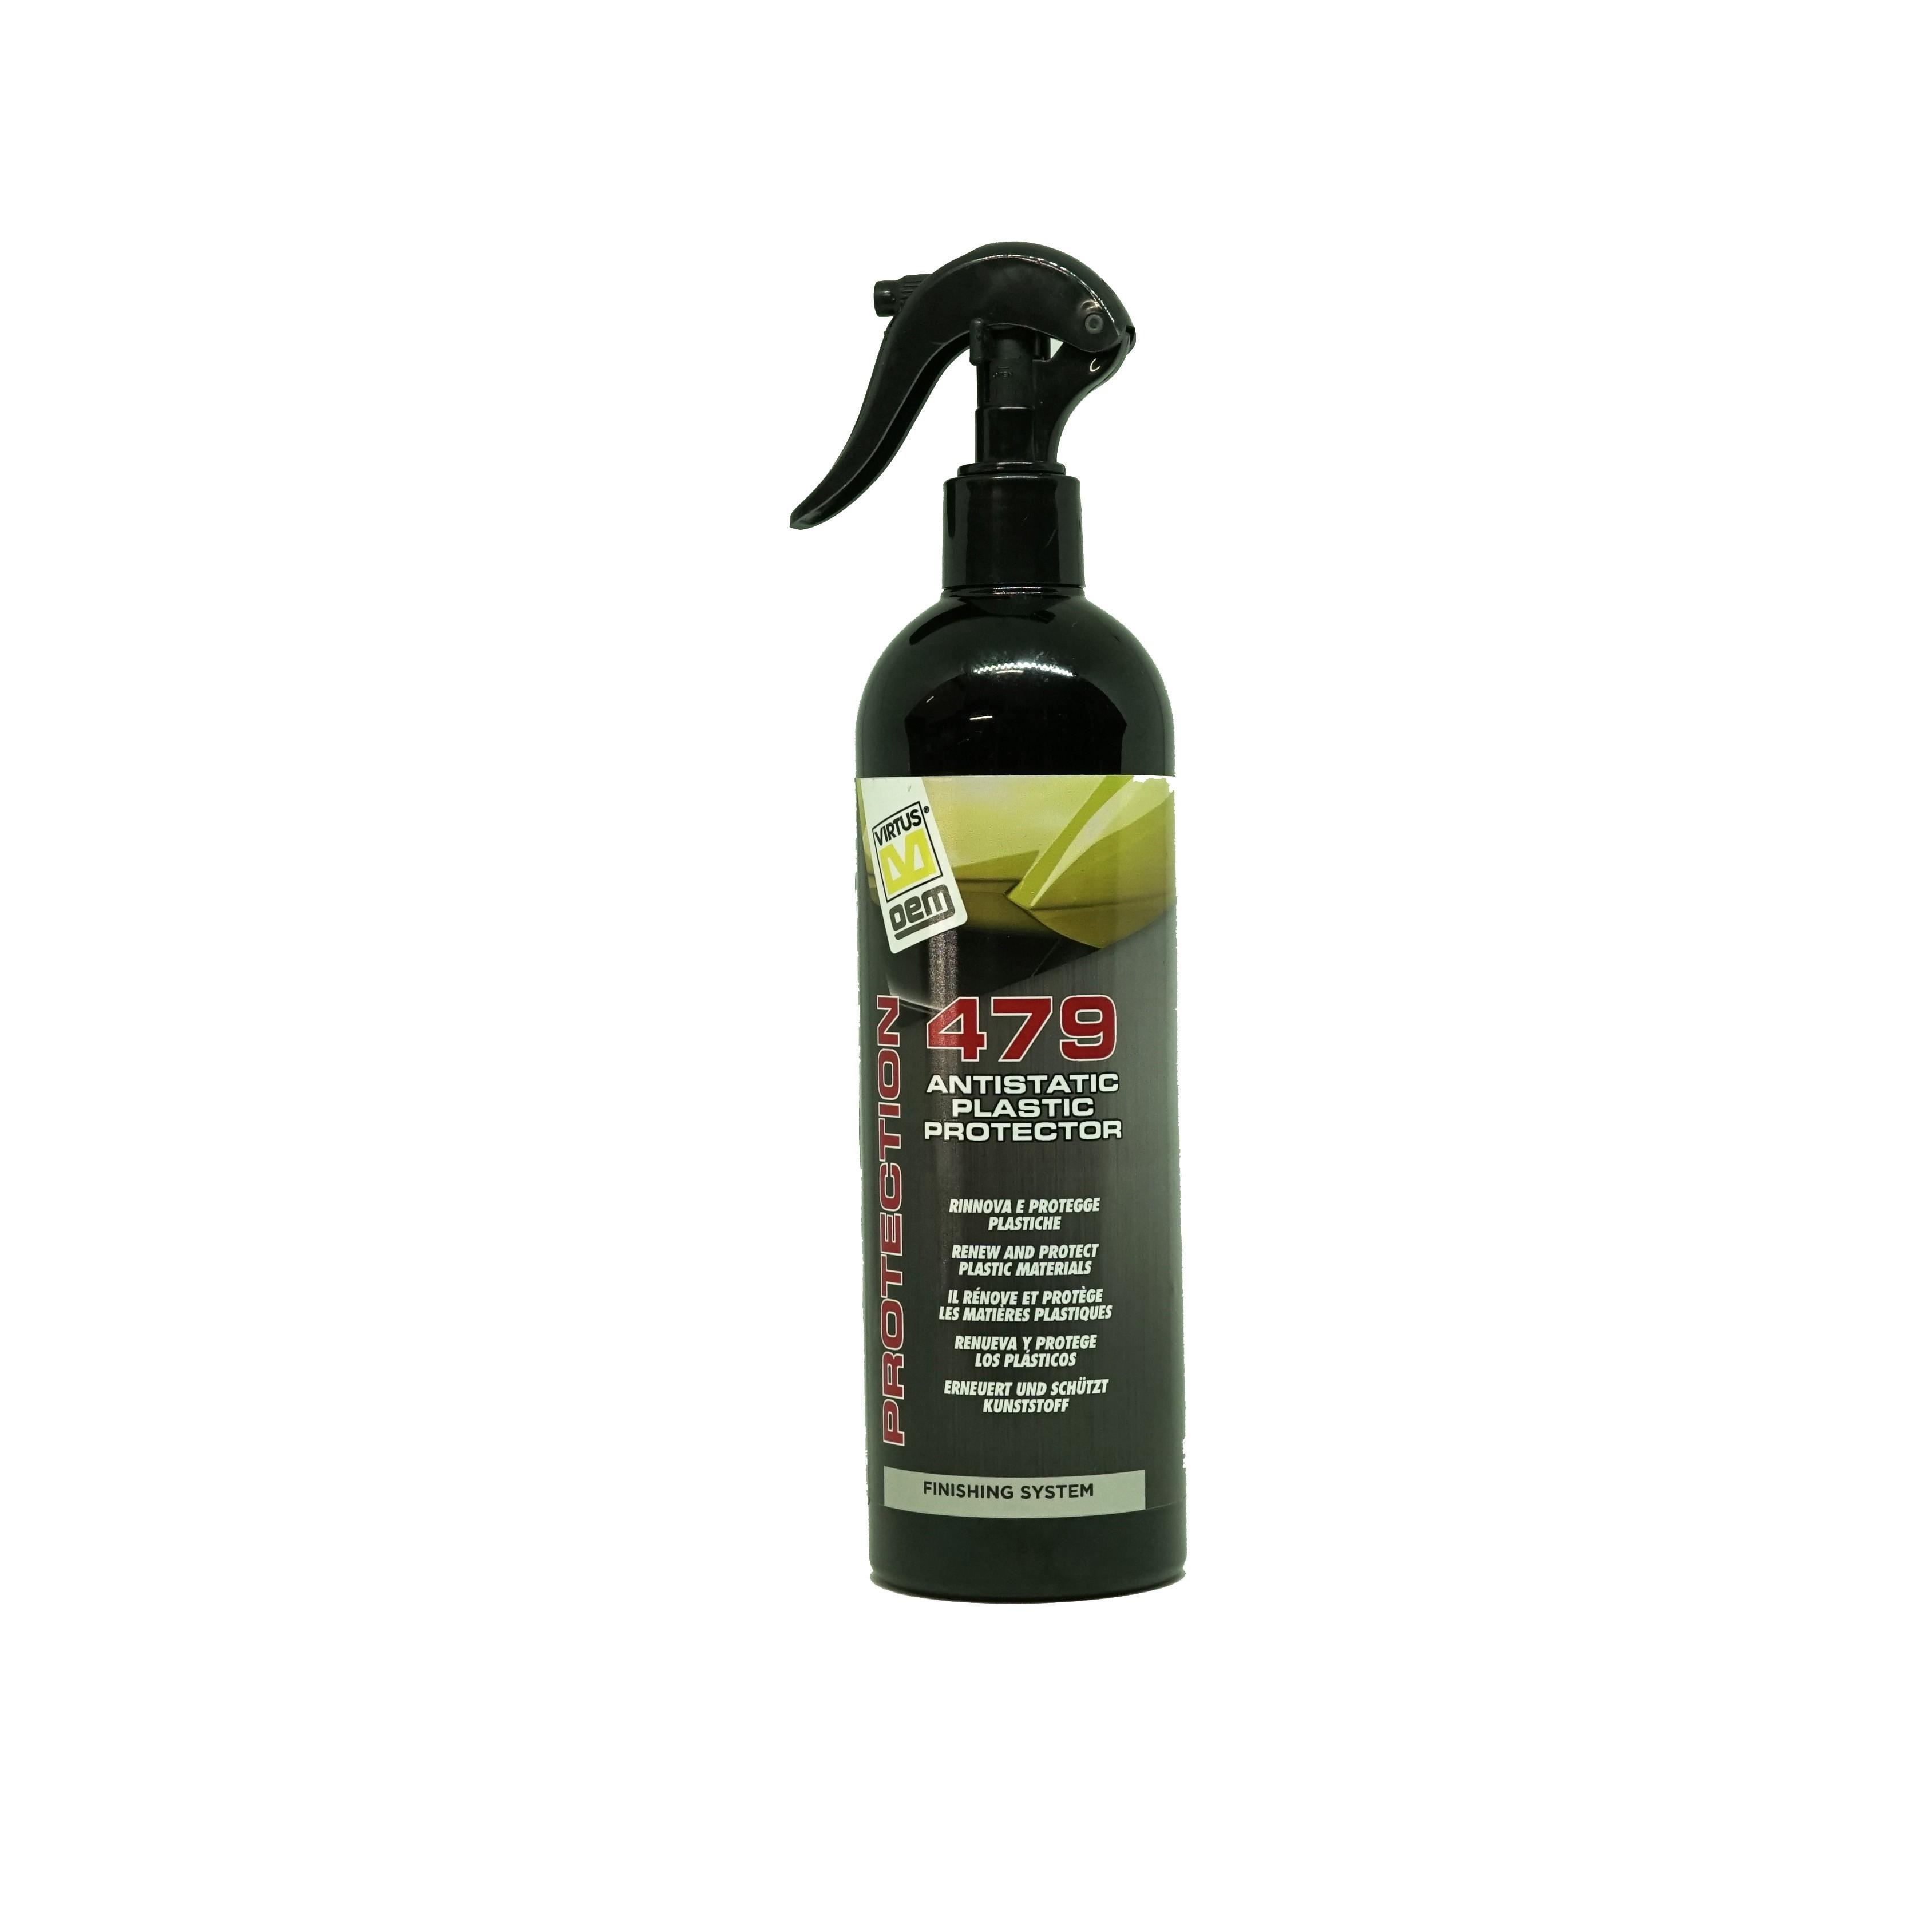 Virtus 479 Antistatic Plastic Protector 500ml